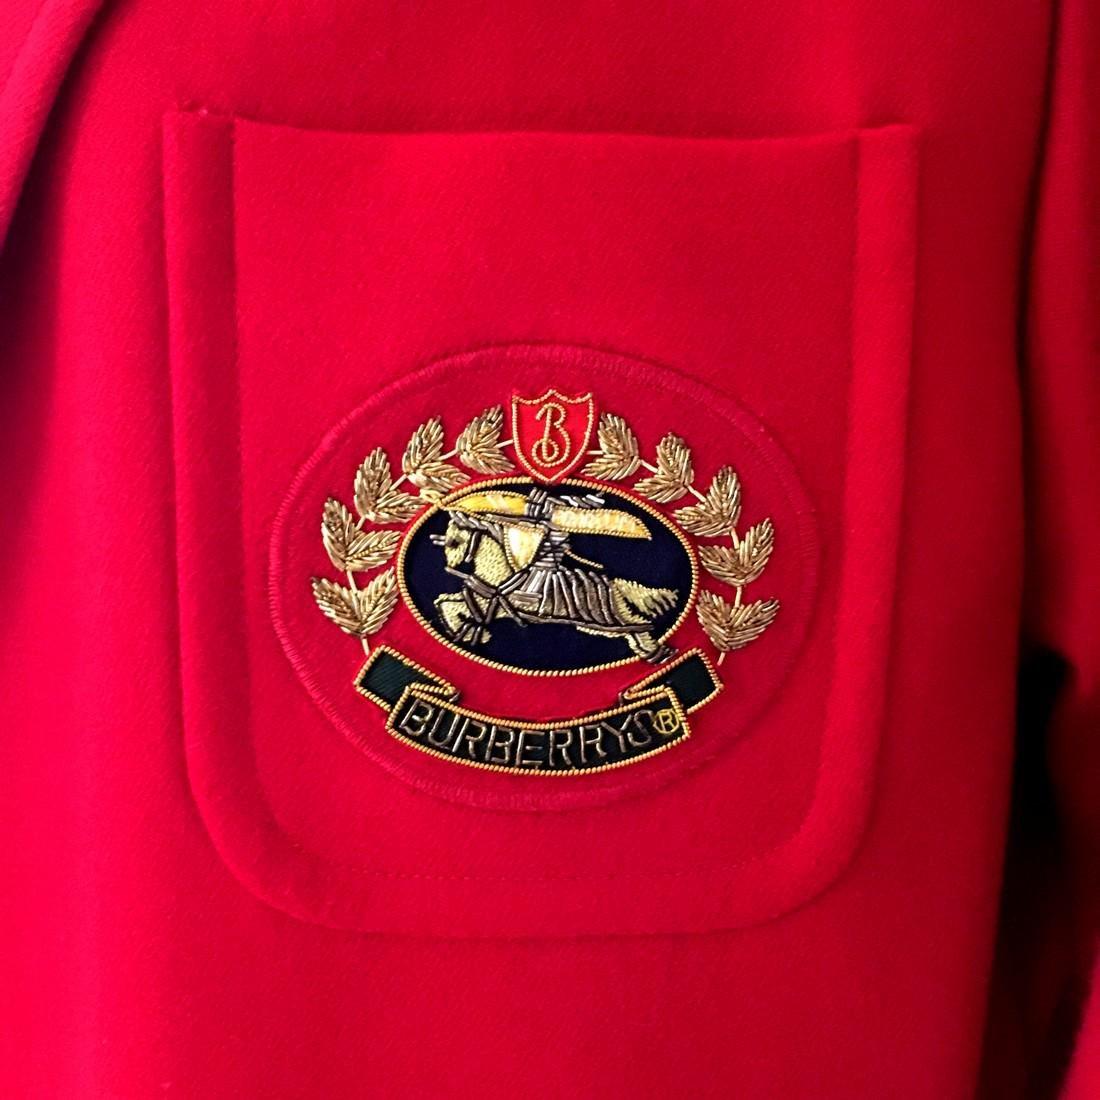 Women's Burberry Vintage 100% Wool Red Jacket Blazer - 3